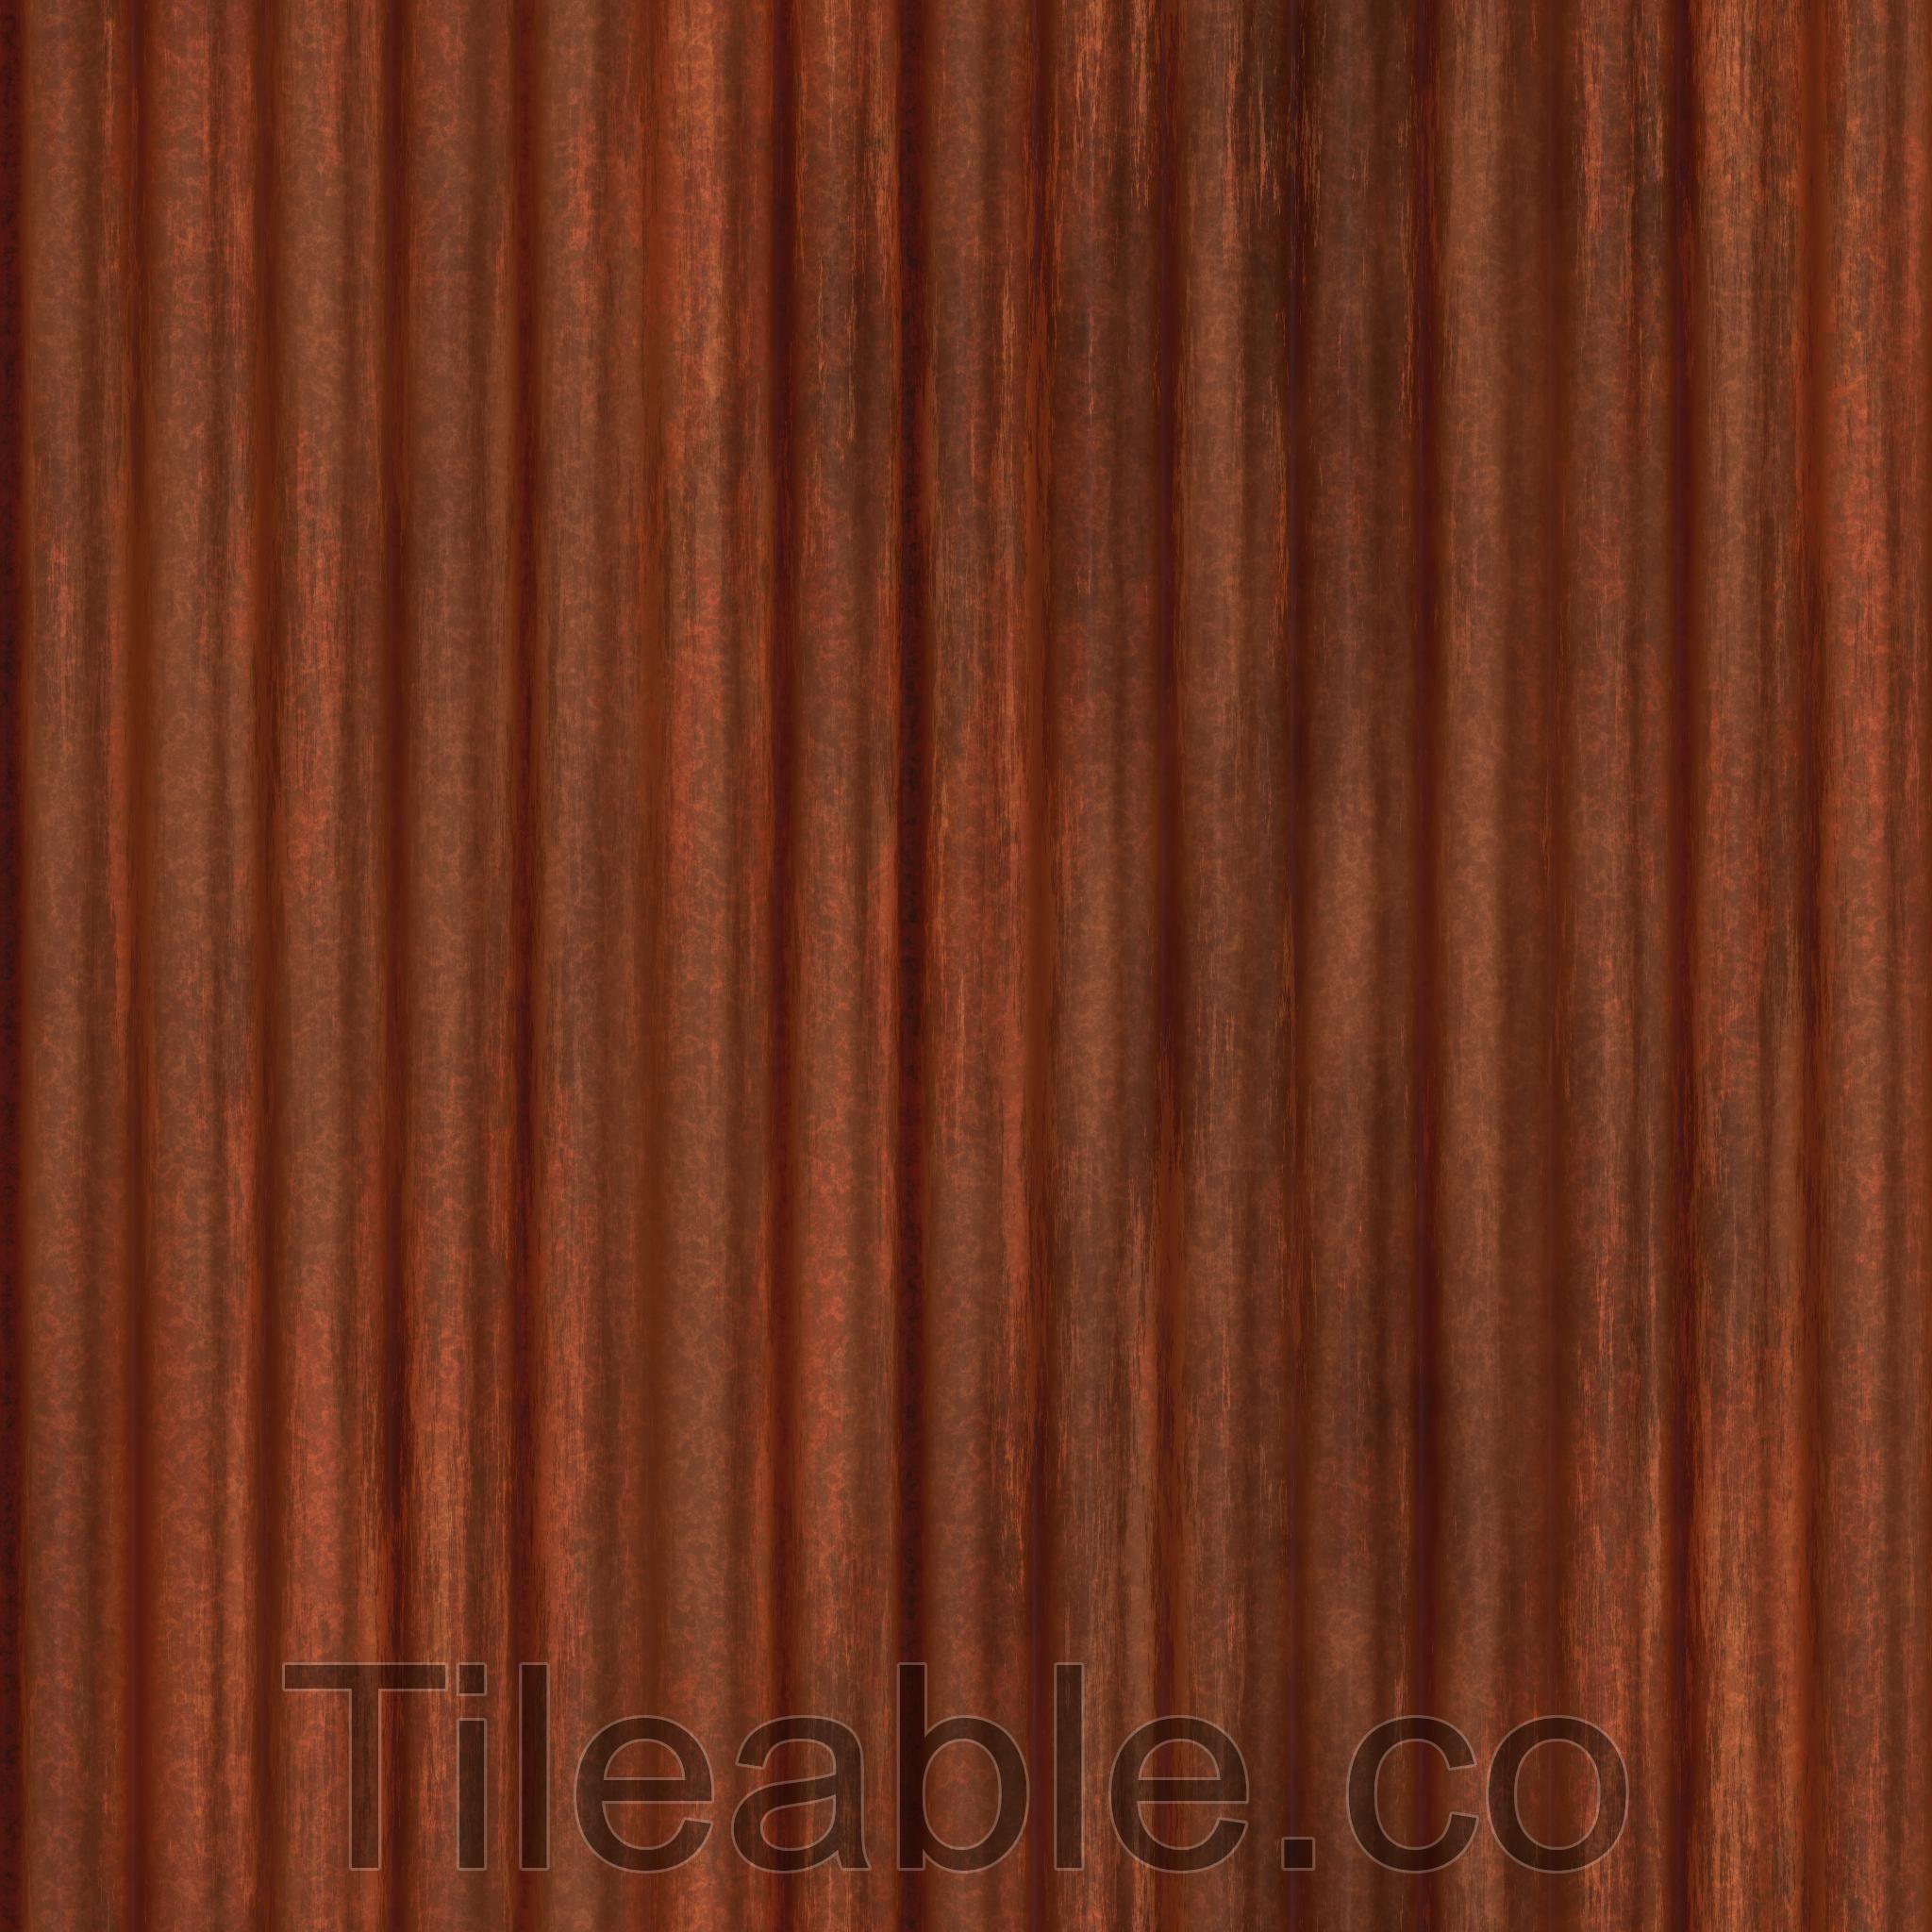 Textures Texture Seamless Corrugated Steel Texture Seamless 09971 Textures Materials Metals Corrugated Steel Textures Metal Texture Corrugated Metal